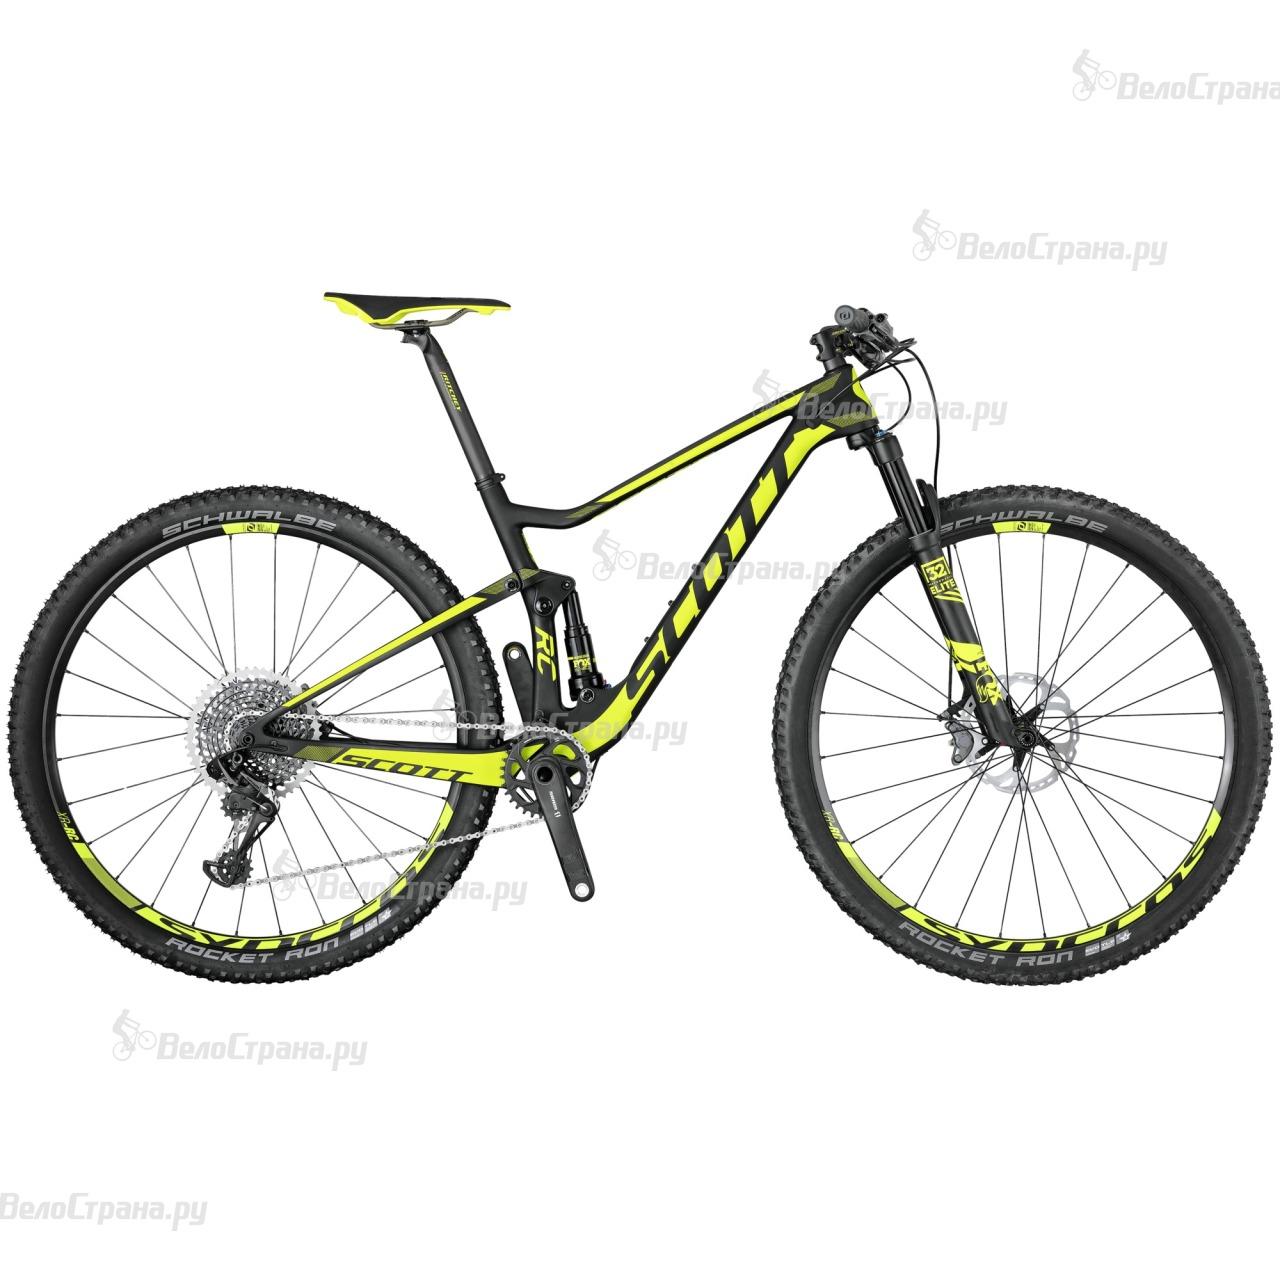 Велосипед Scott Spark RC 700 World Cup (2017)